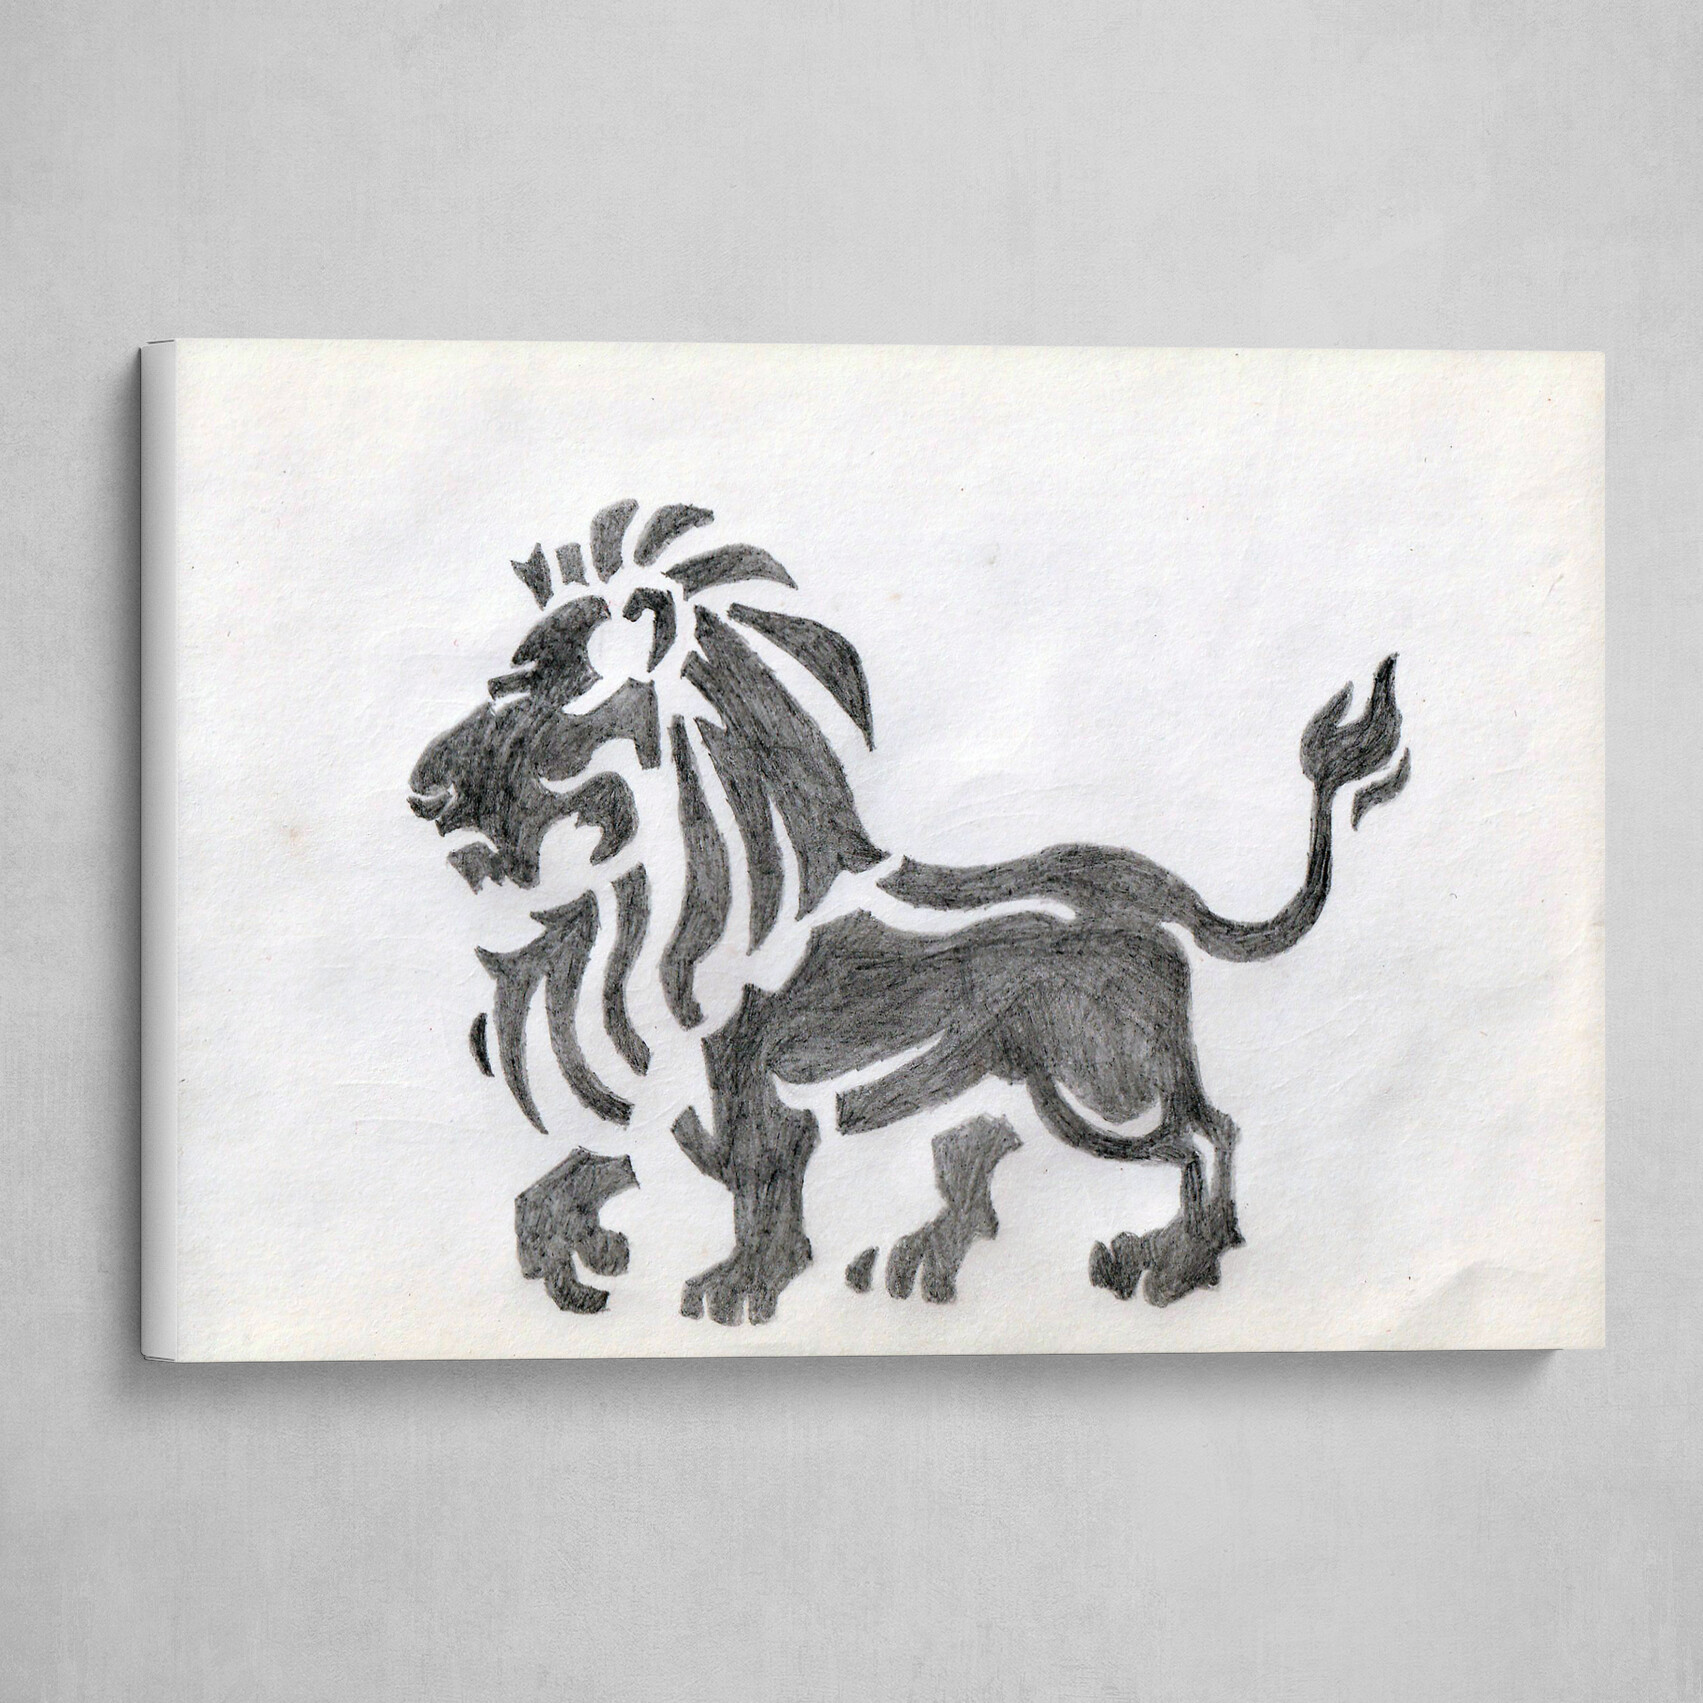 Lion Side Body Sketch